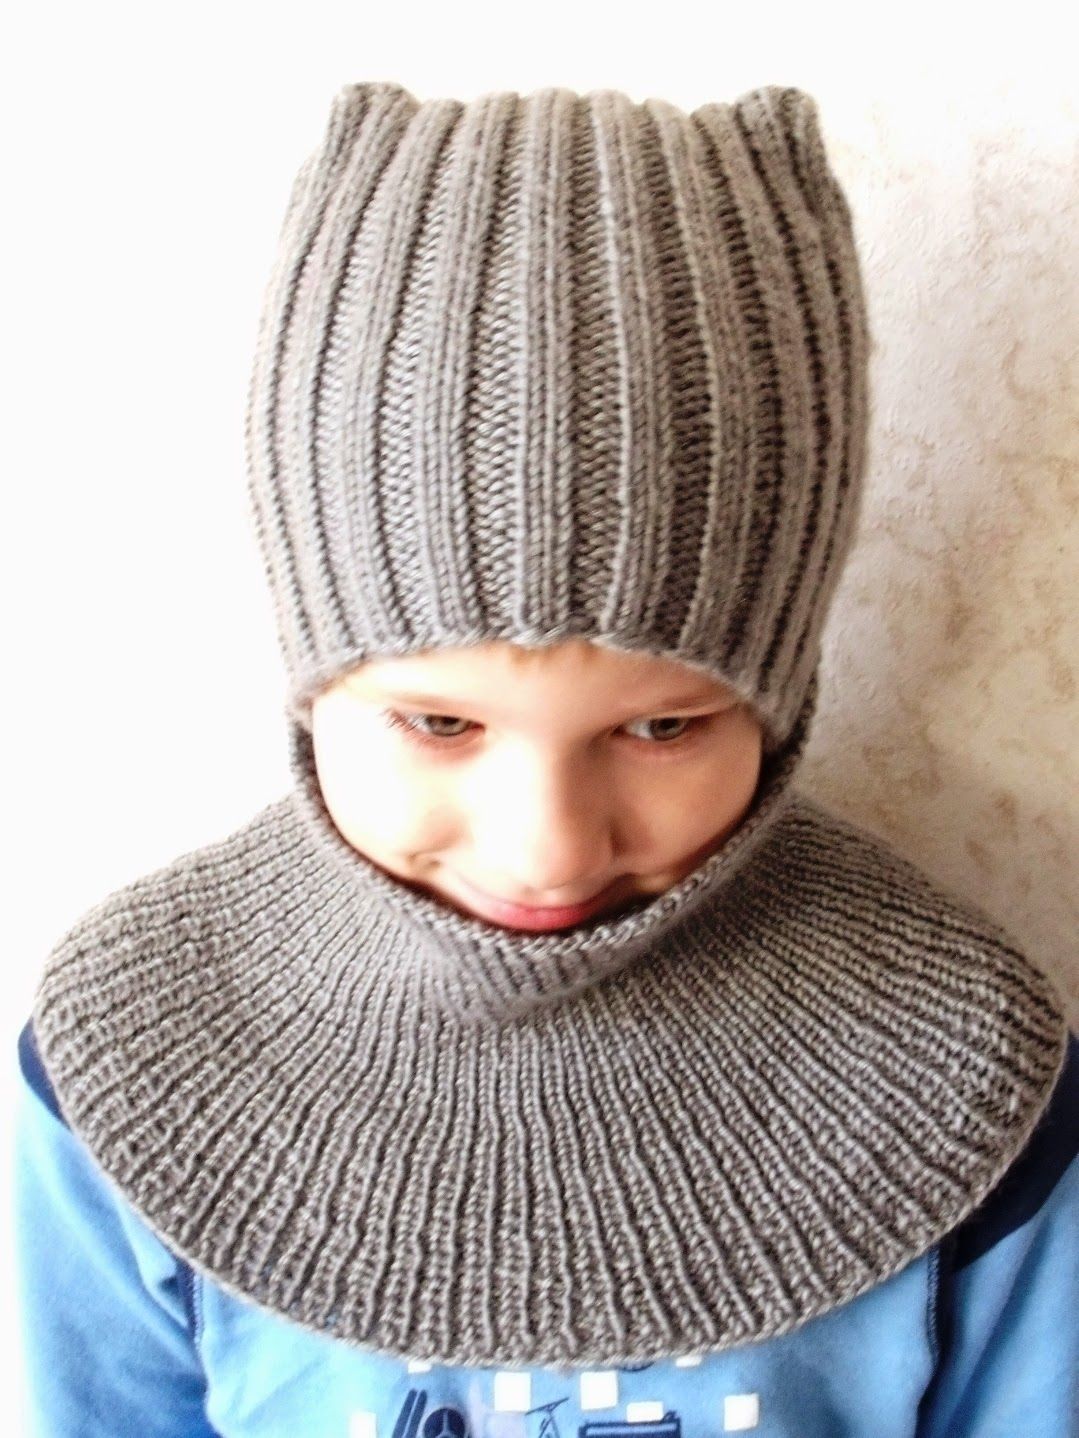 комплект для мальчика, шапка для мальчика,  серый, vita, вязание спицами, свяжу на заказ